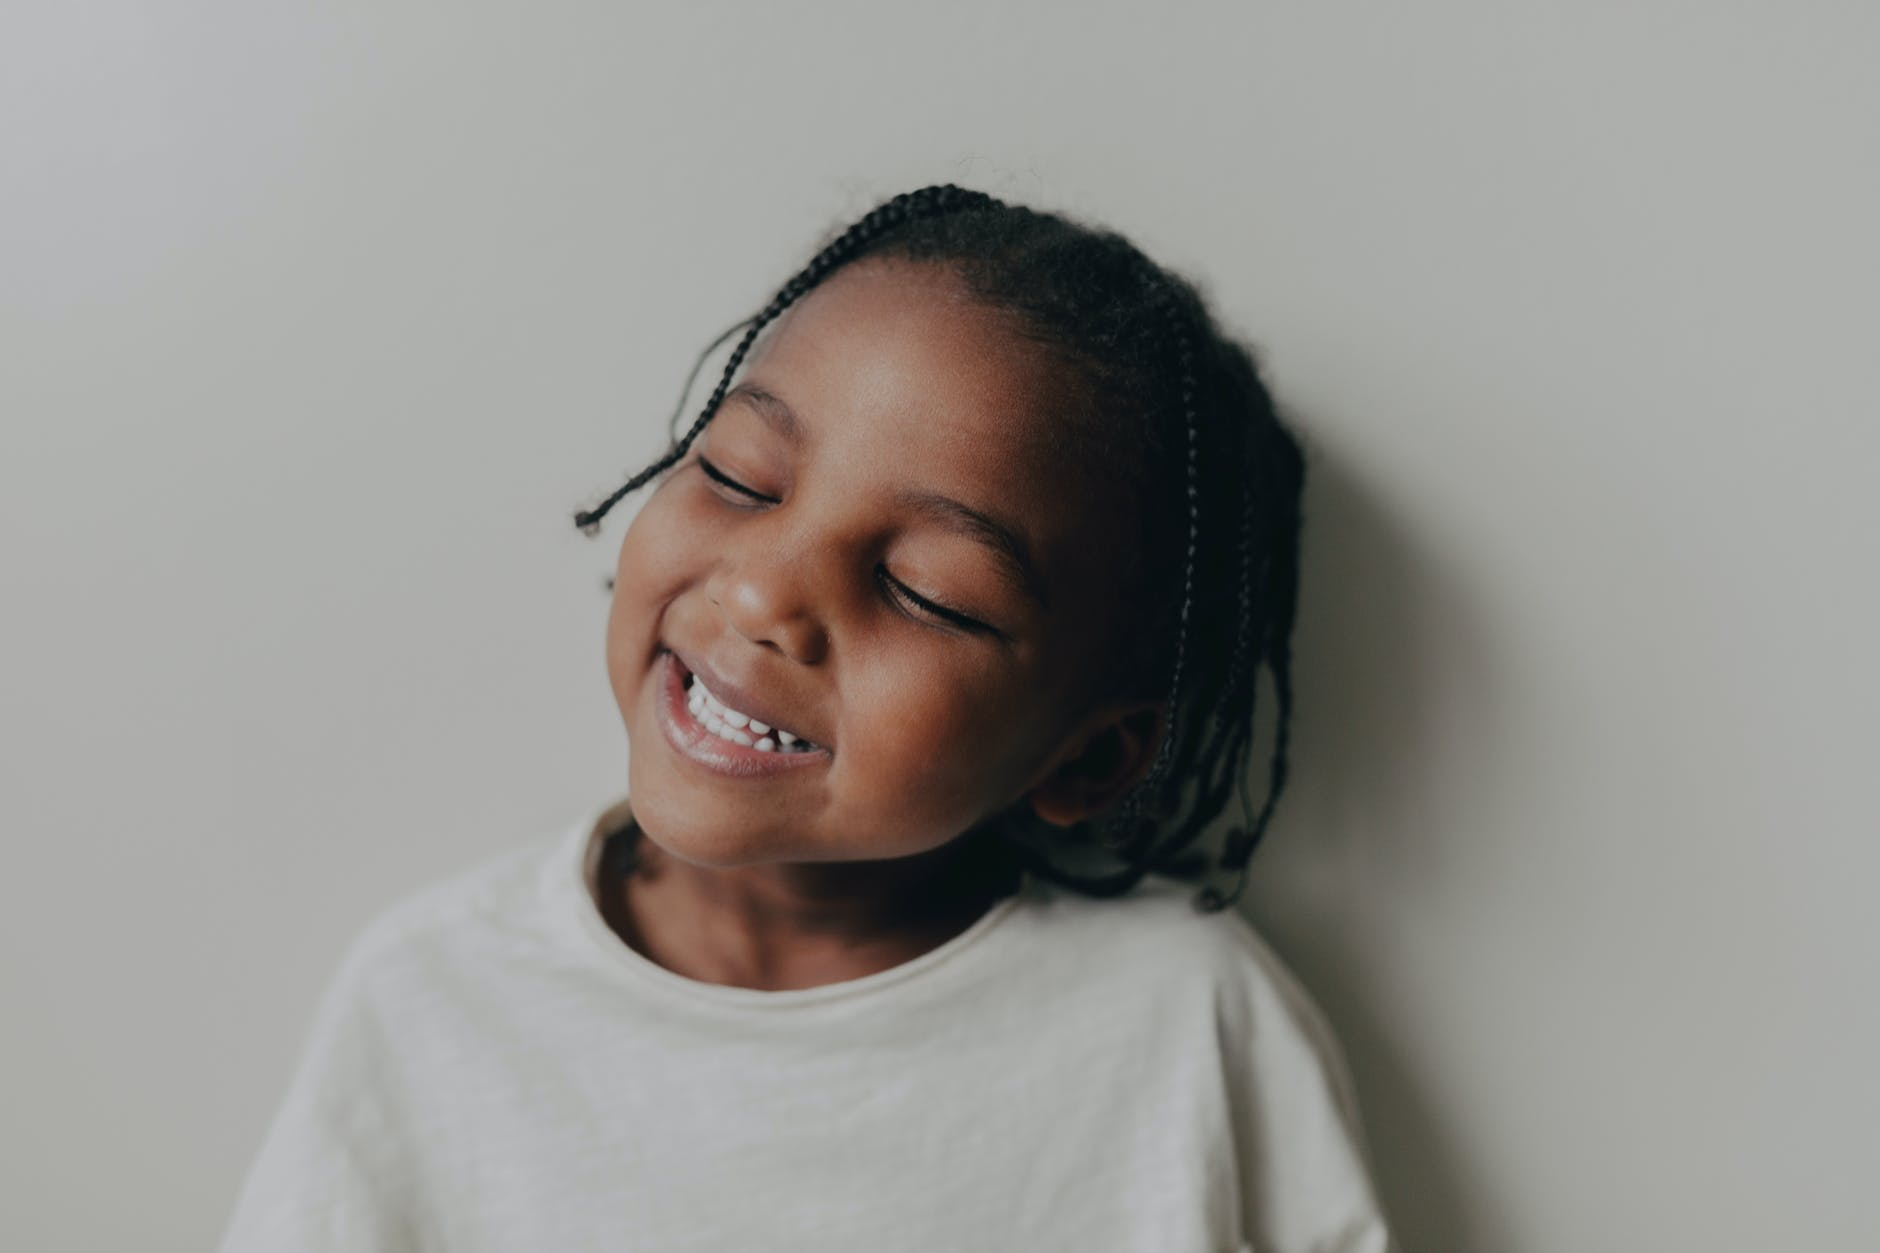 smiling girl in white crew neck shirt